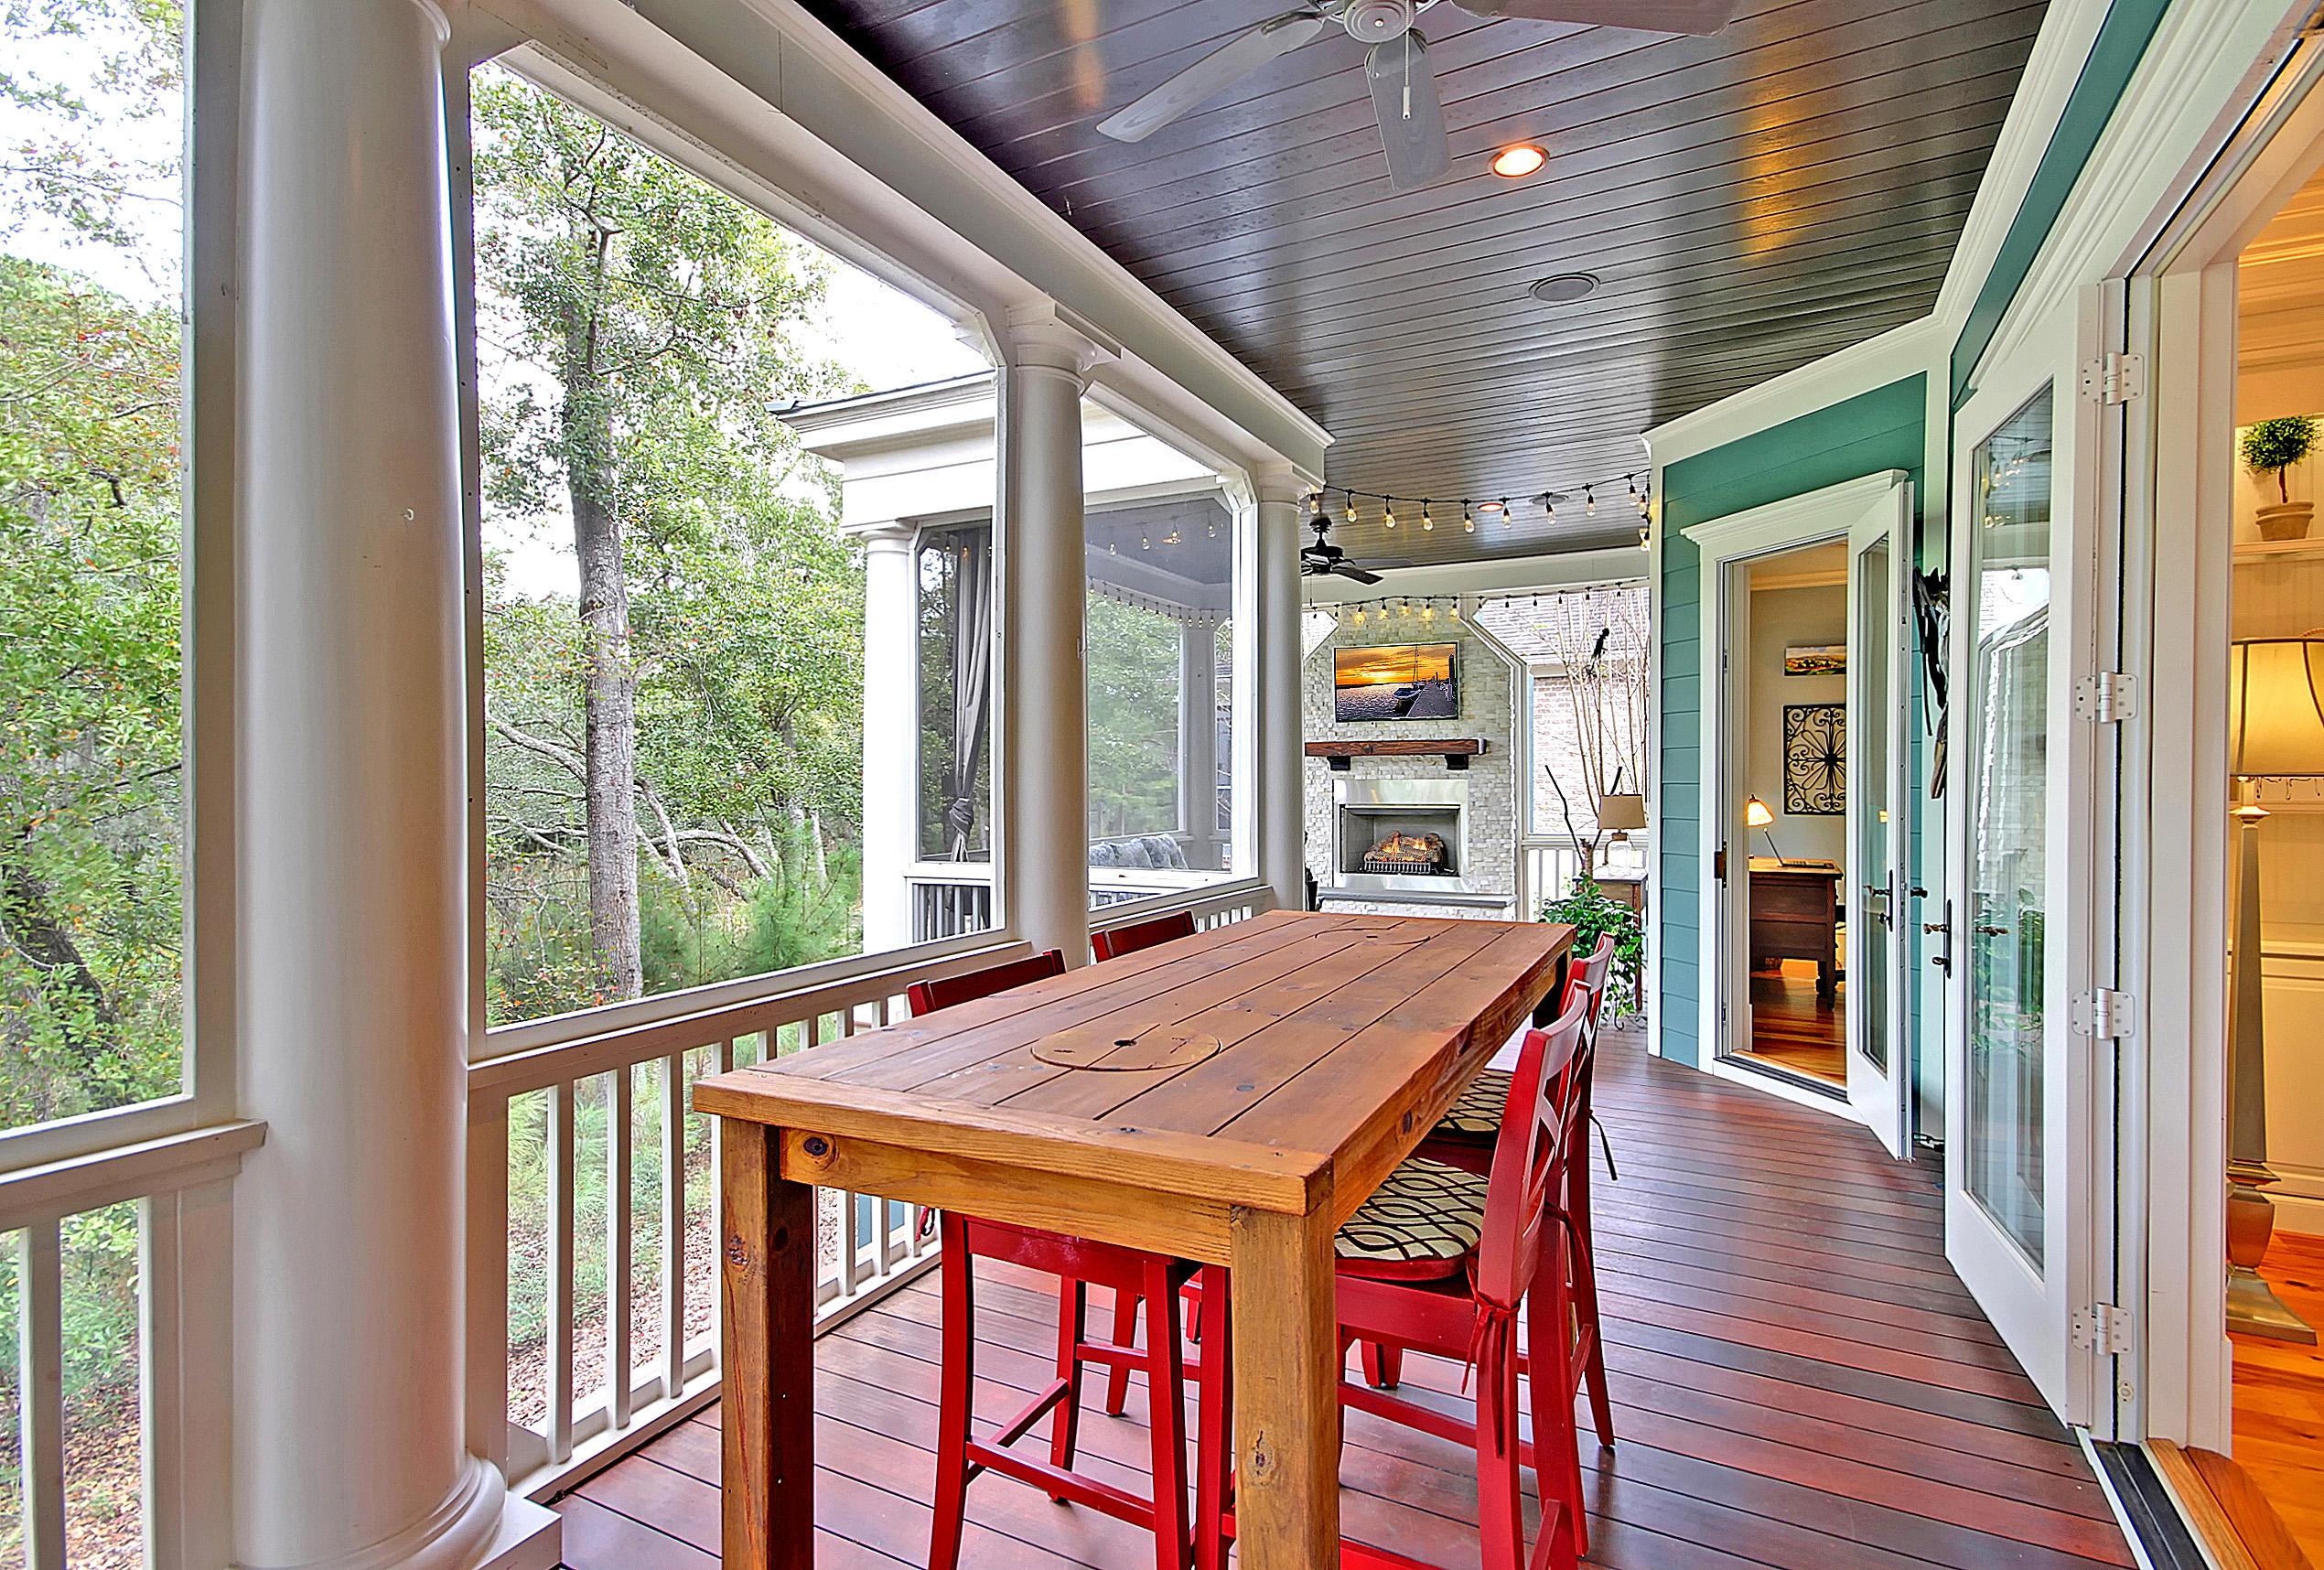 Daniel Island Homes For Sale - 1136 Oak Overhang, Daniel Island, SC - 10